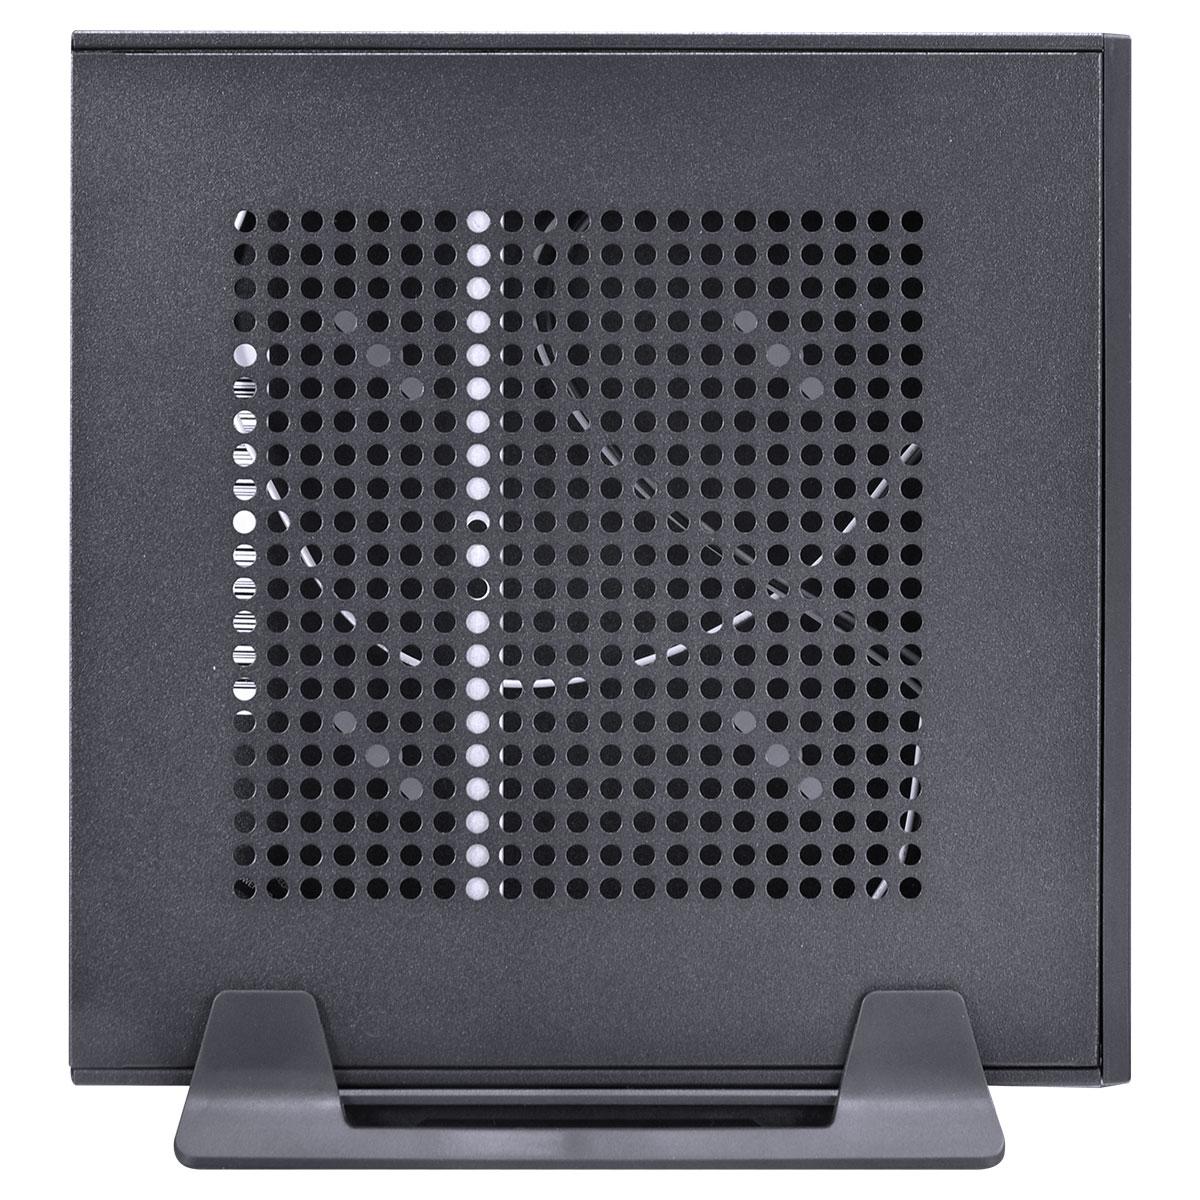 MINI COMPUTADOR BUSINESS B100 - CELERON DUAL CORE J1800 2.41GHZ 4GB DDR3 SODIMM SSD 120GB HDMI/VGA FONTE 60W WIN 10 PRO  - Audio Video & cia